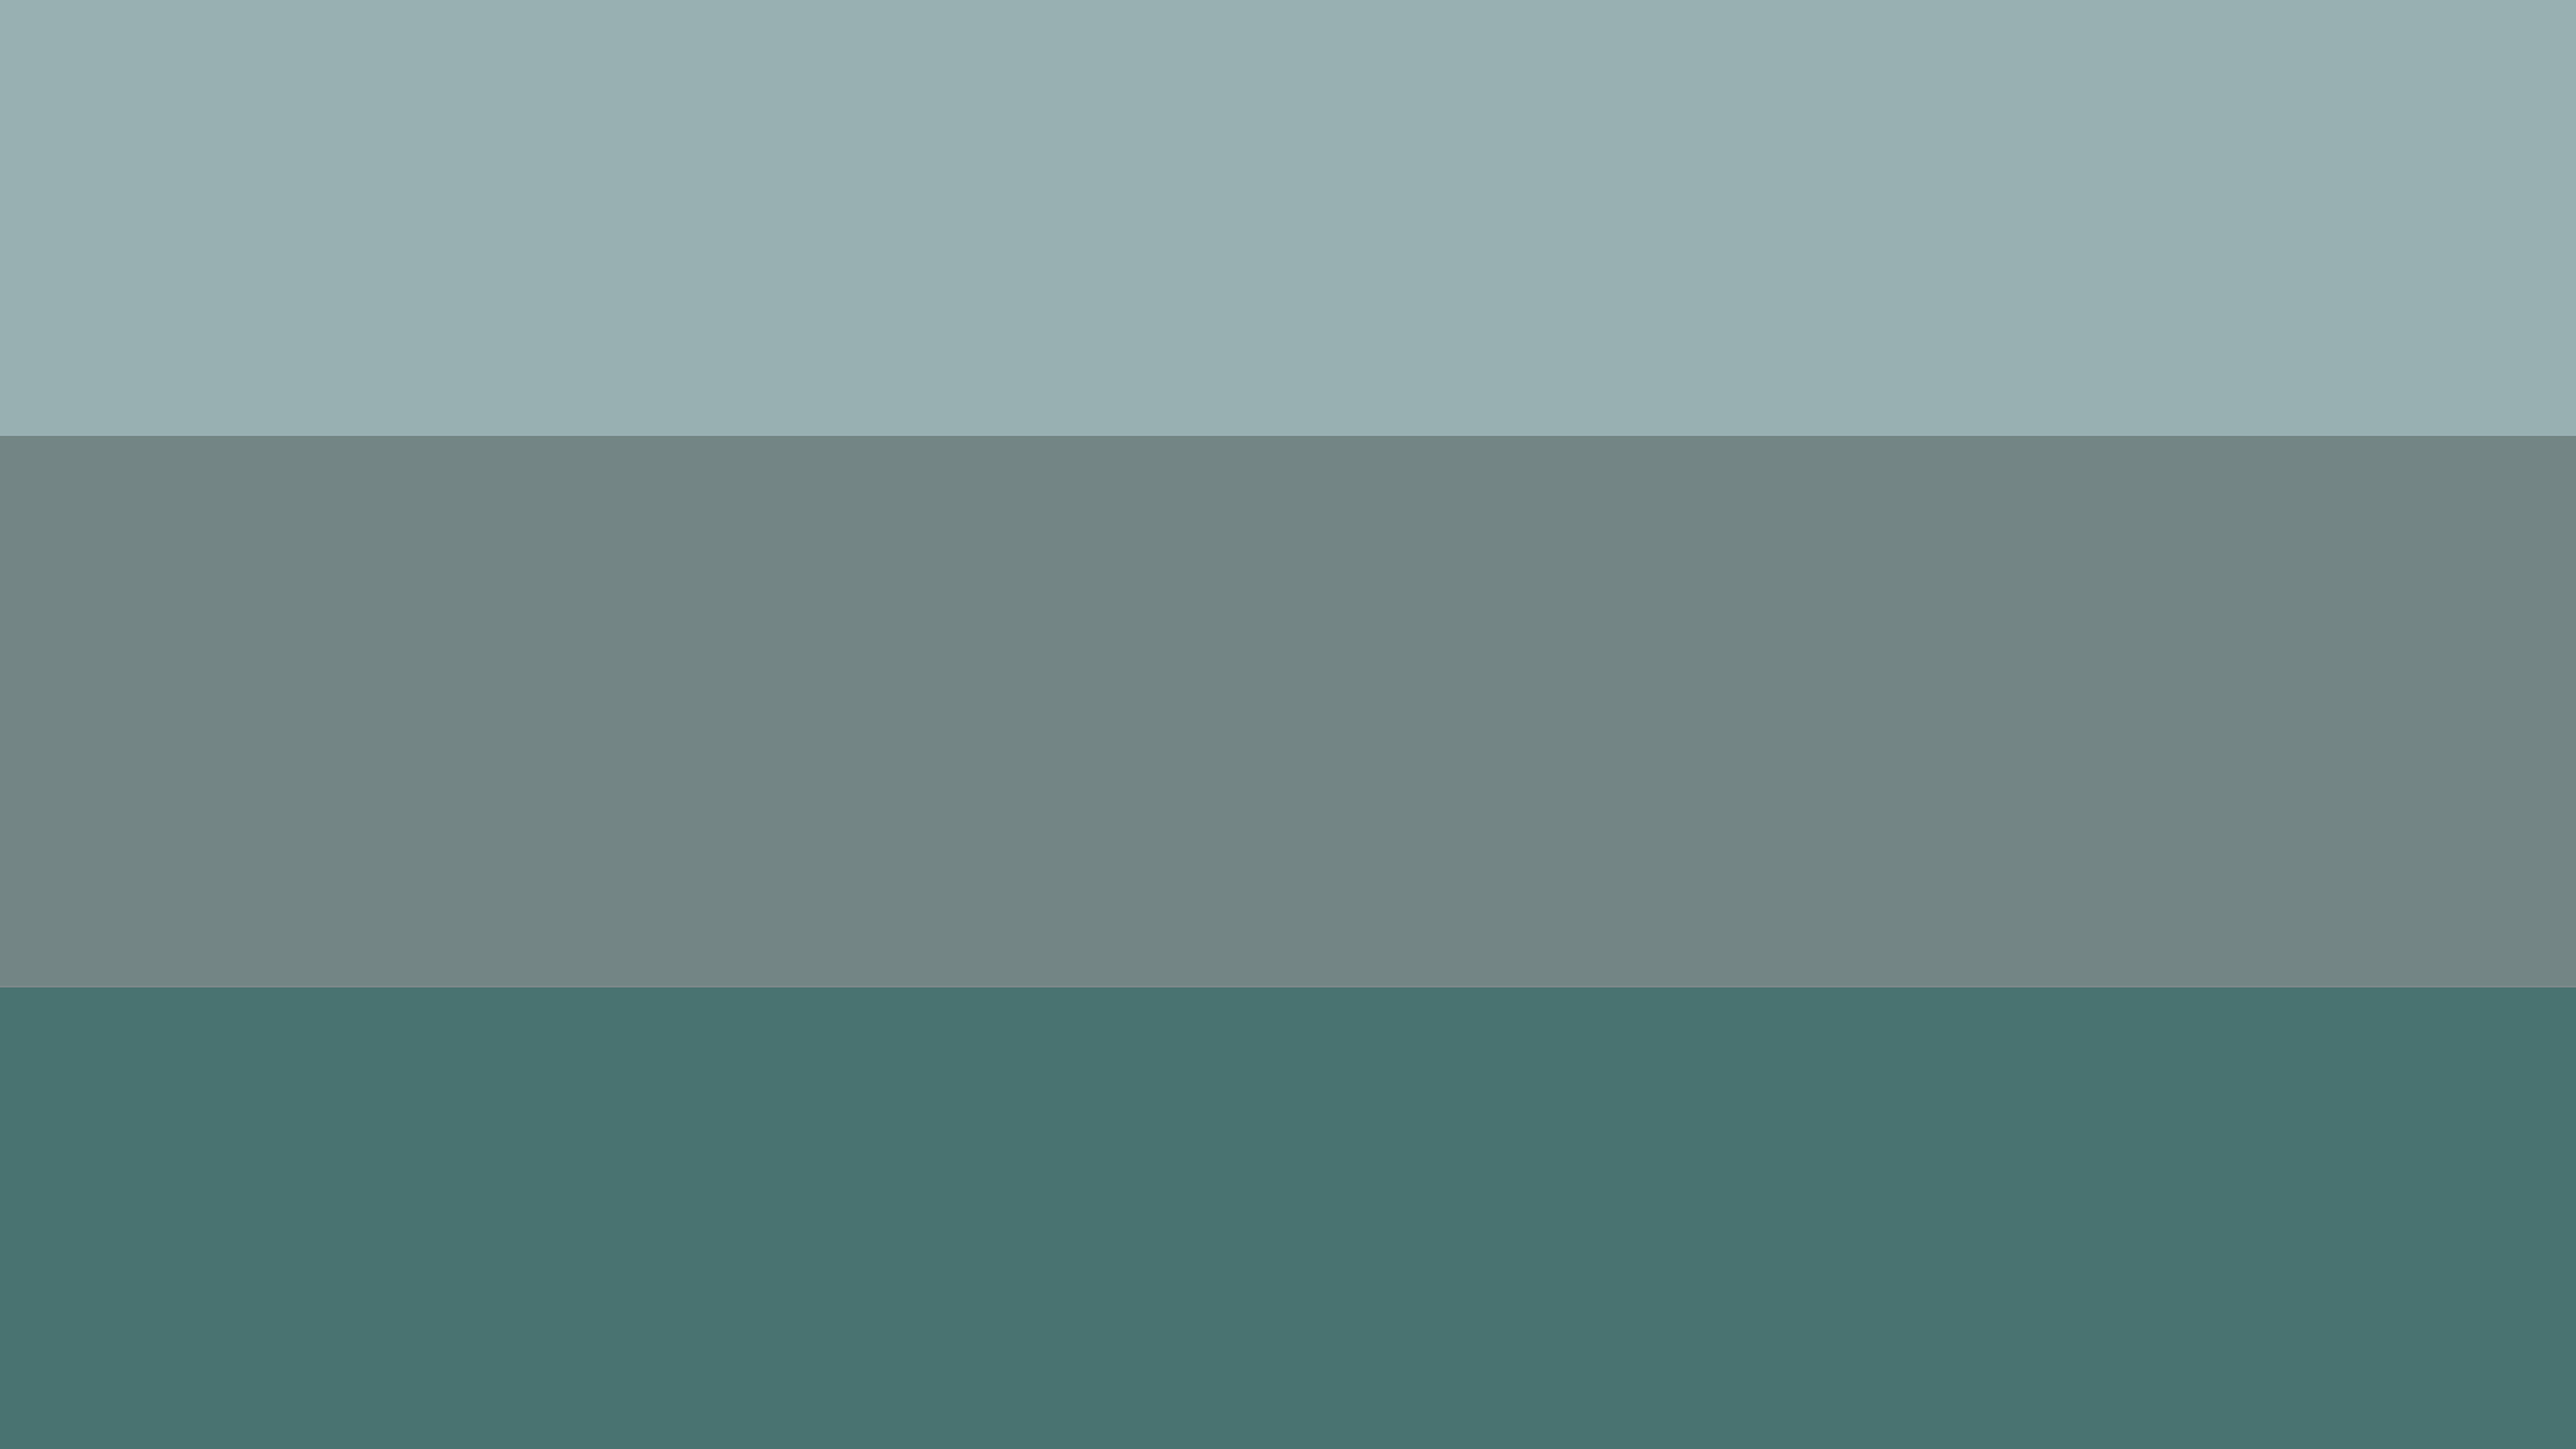 New Design Car Wallpaper Vj48 Colorlovers Pattern Green Simple Wallpaper